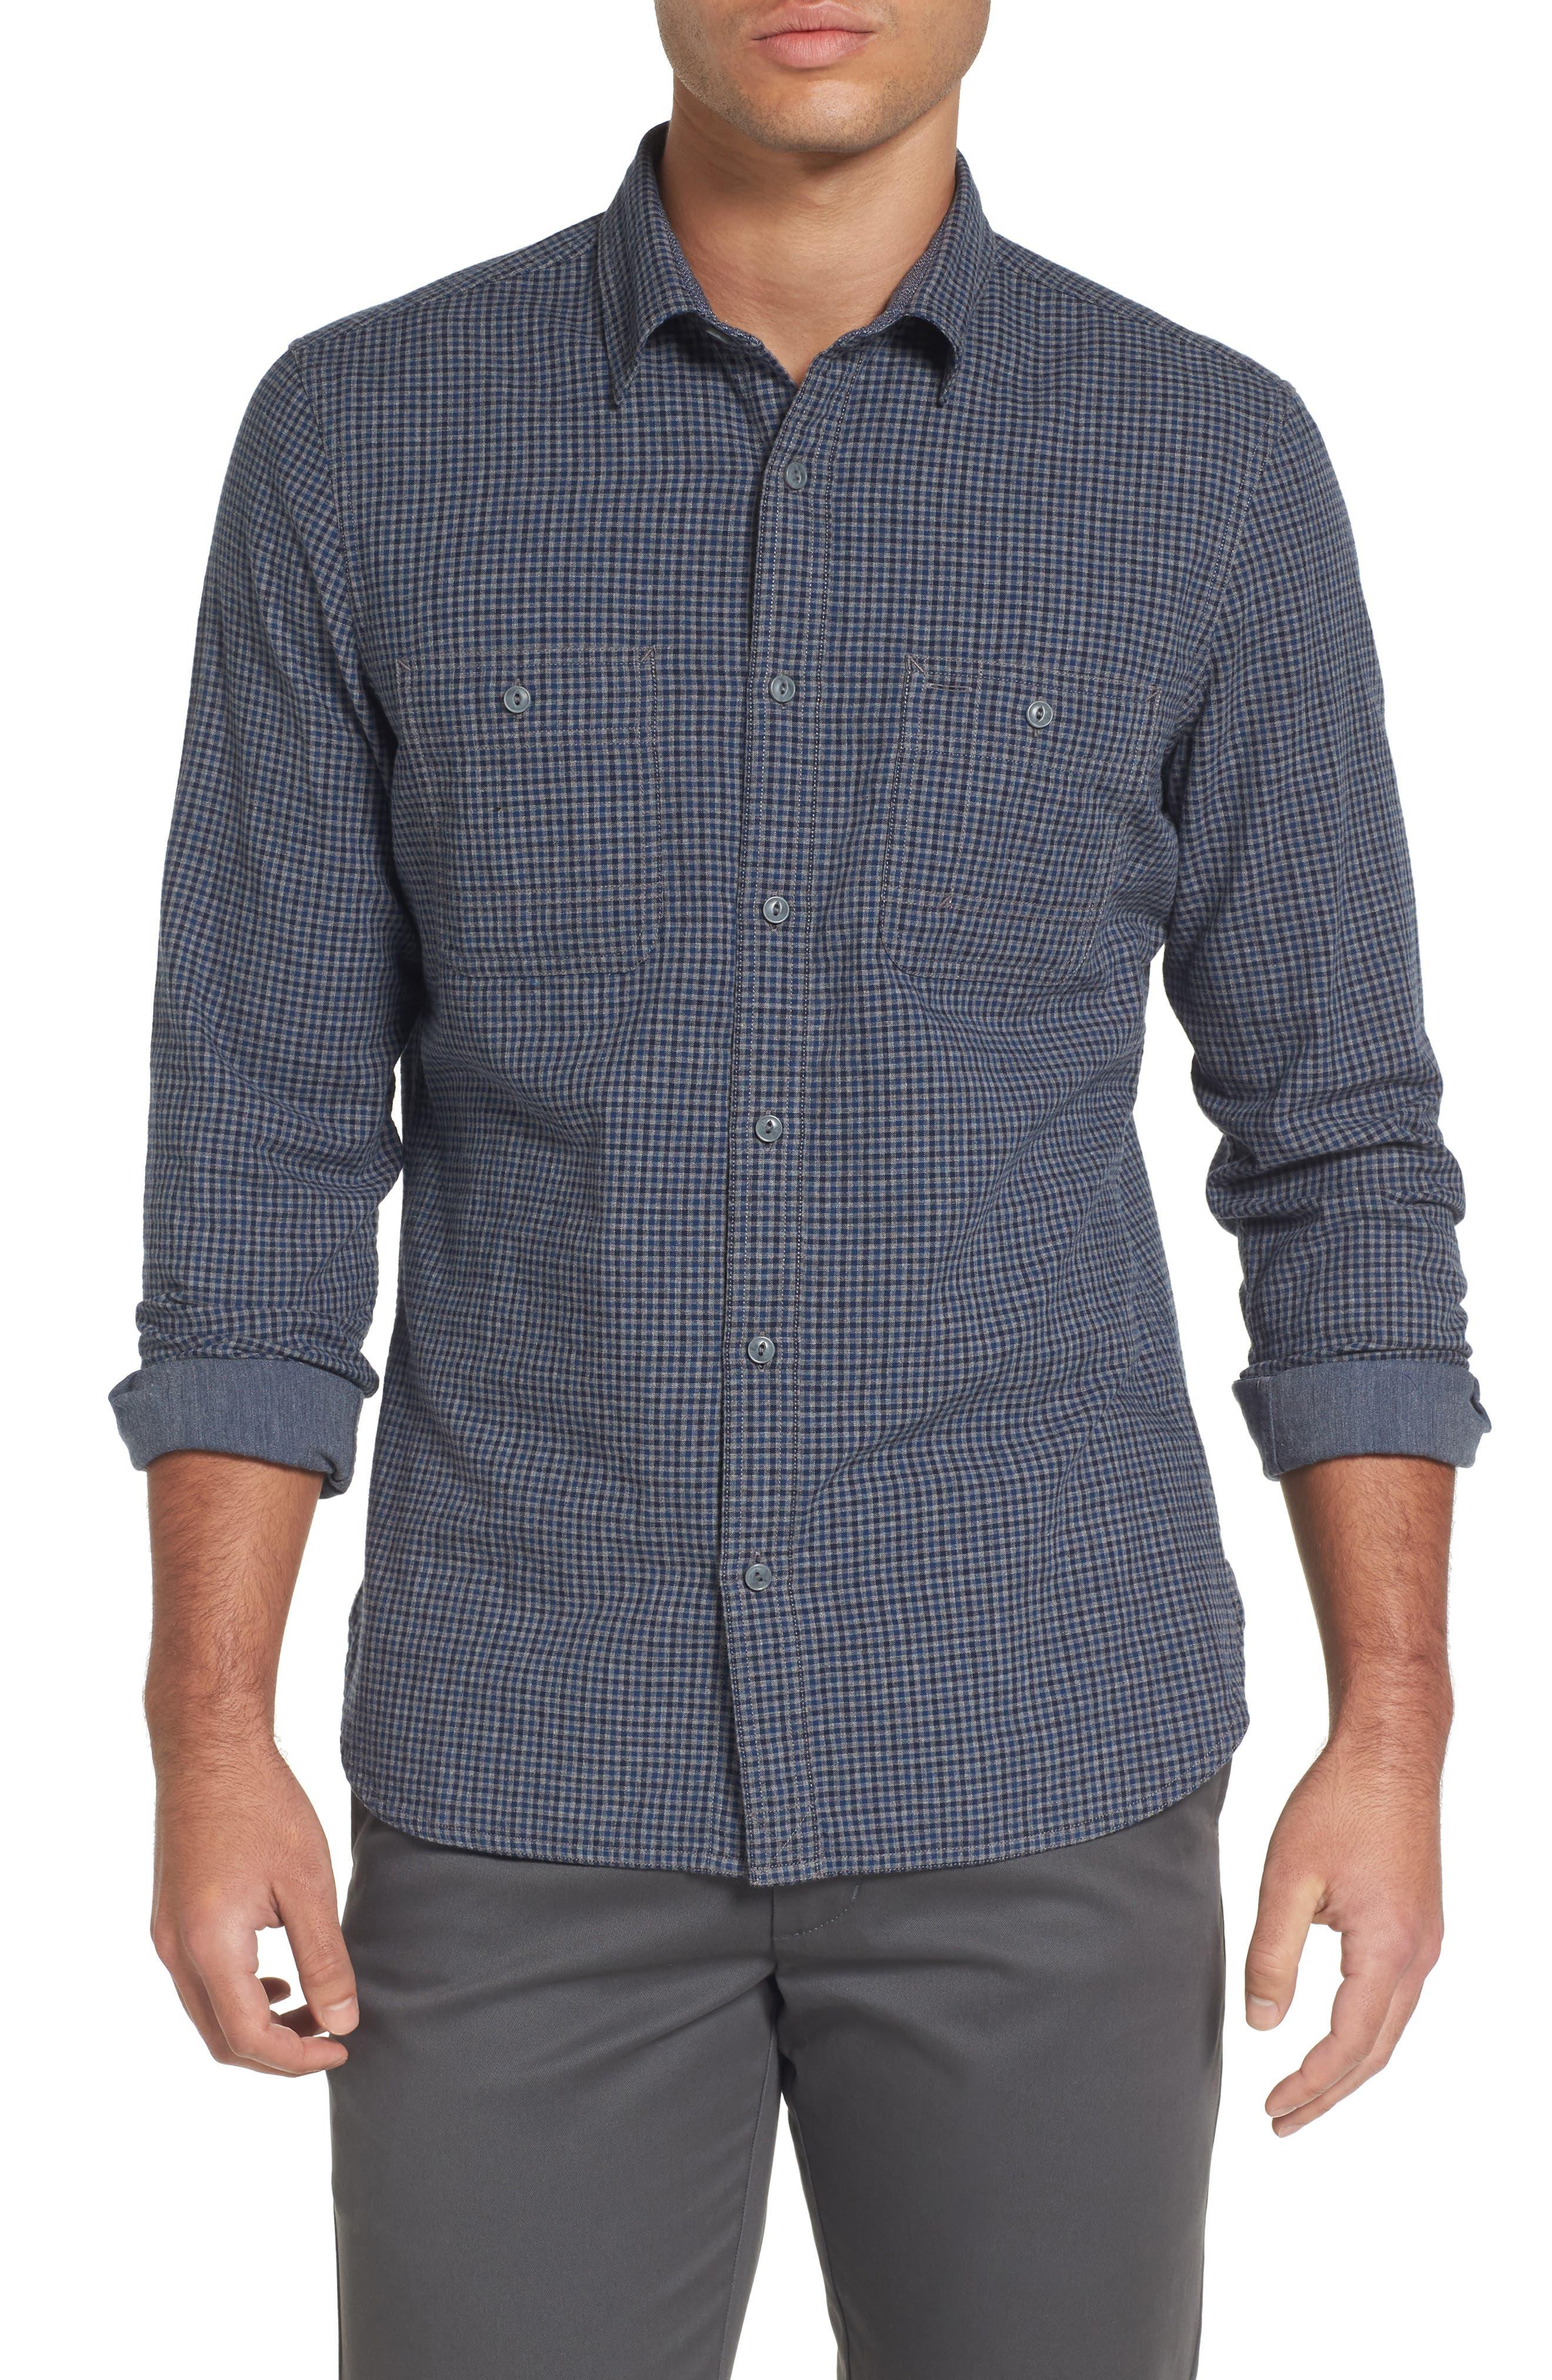 Alternate Image 1 Selected - Nordstrom Men's Shop Slim Fit Micro Check Sport Shirt